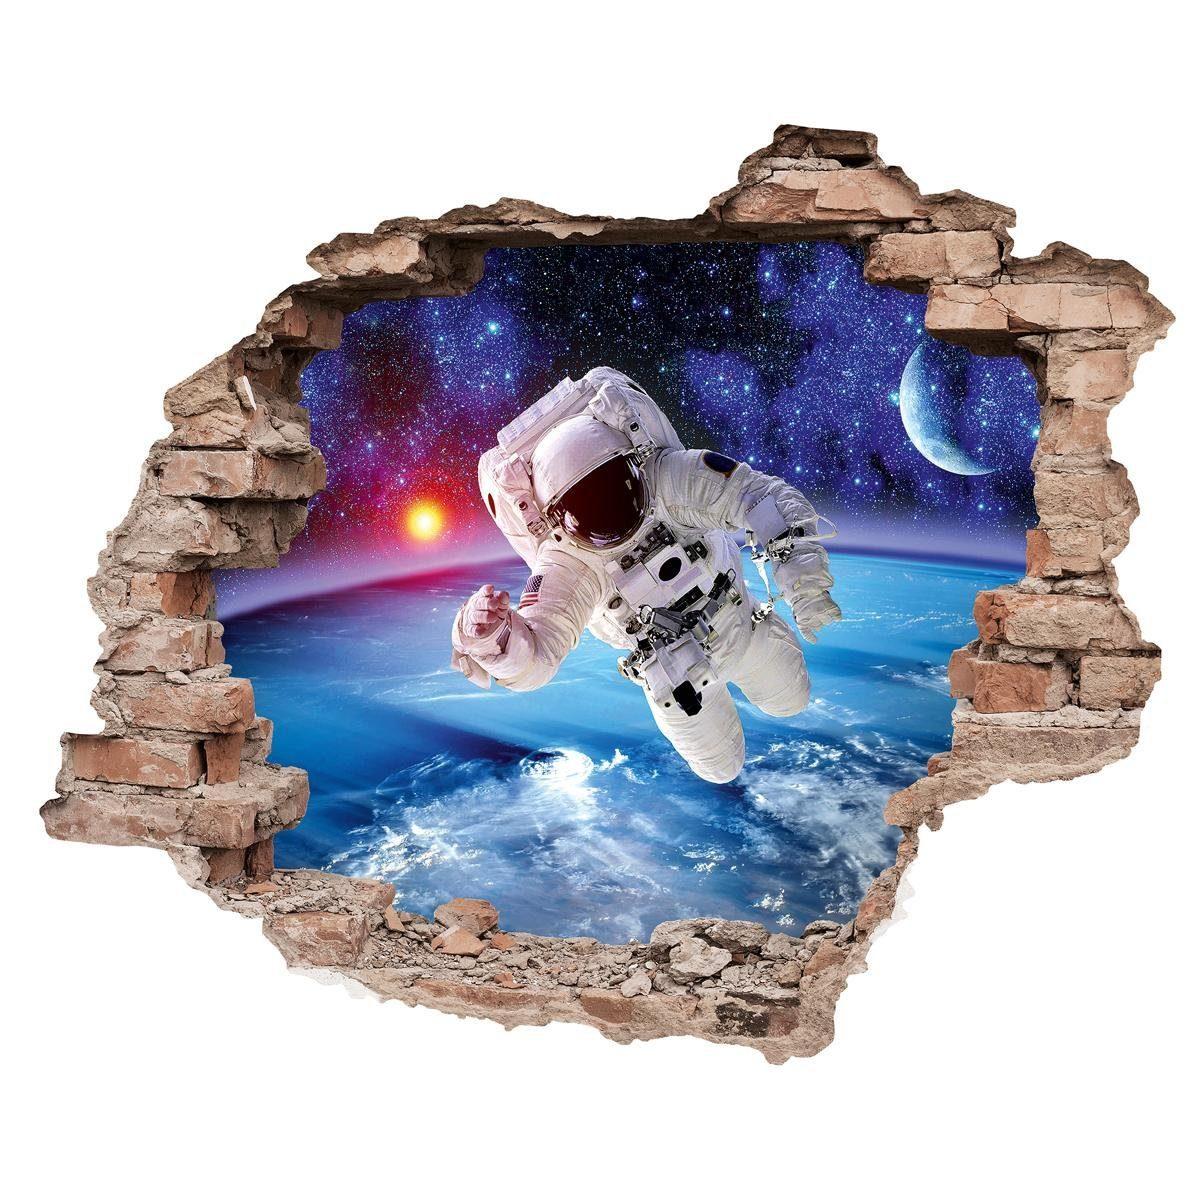 EUROGRAPHICS Wandtattoos »Astronaut Spaceman«, 70/50 cm